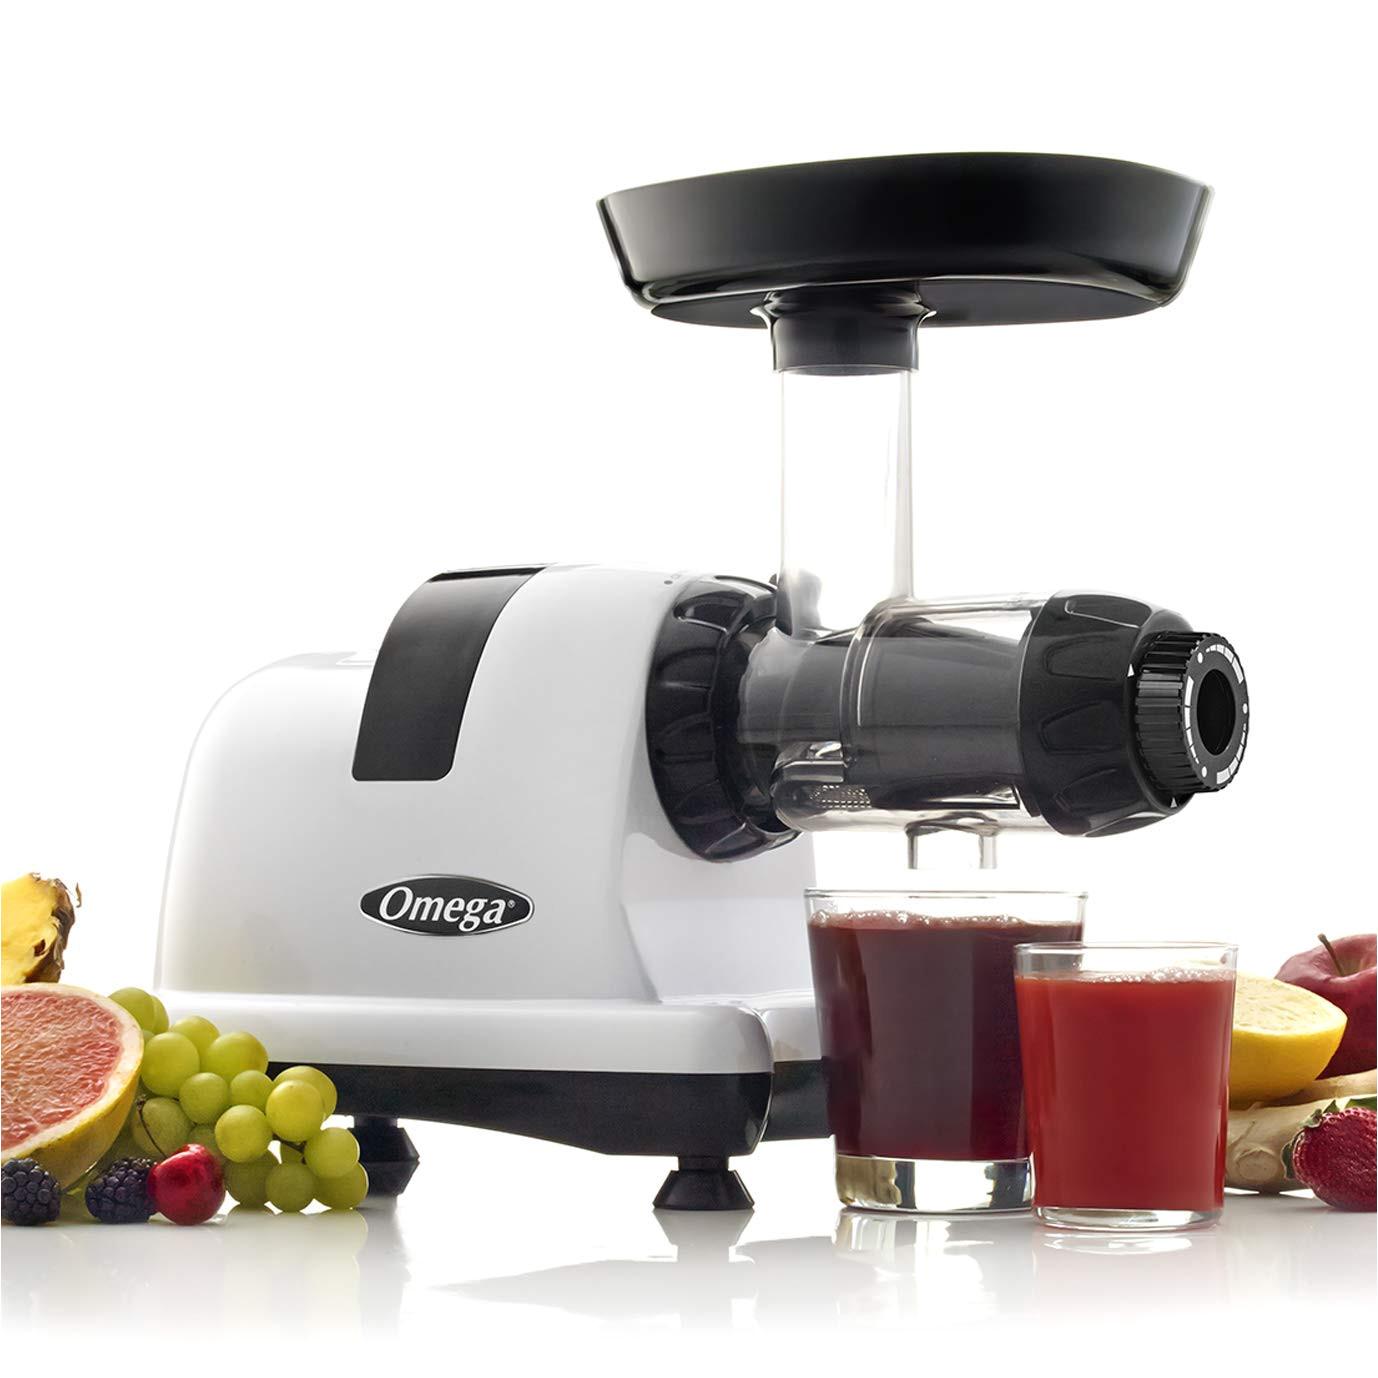 amazon com omega j8006 nutrition center masticating dual stage juicer metallic electric masticating juicers kitchen dining